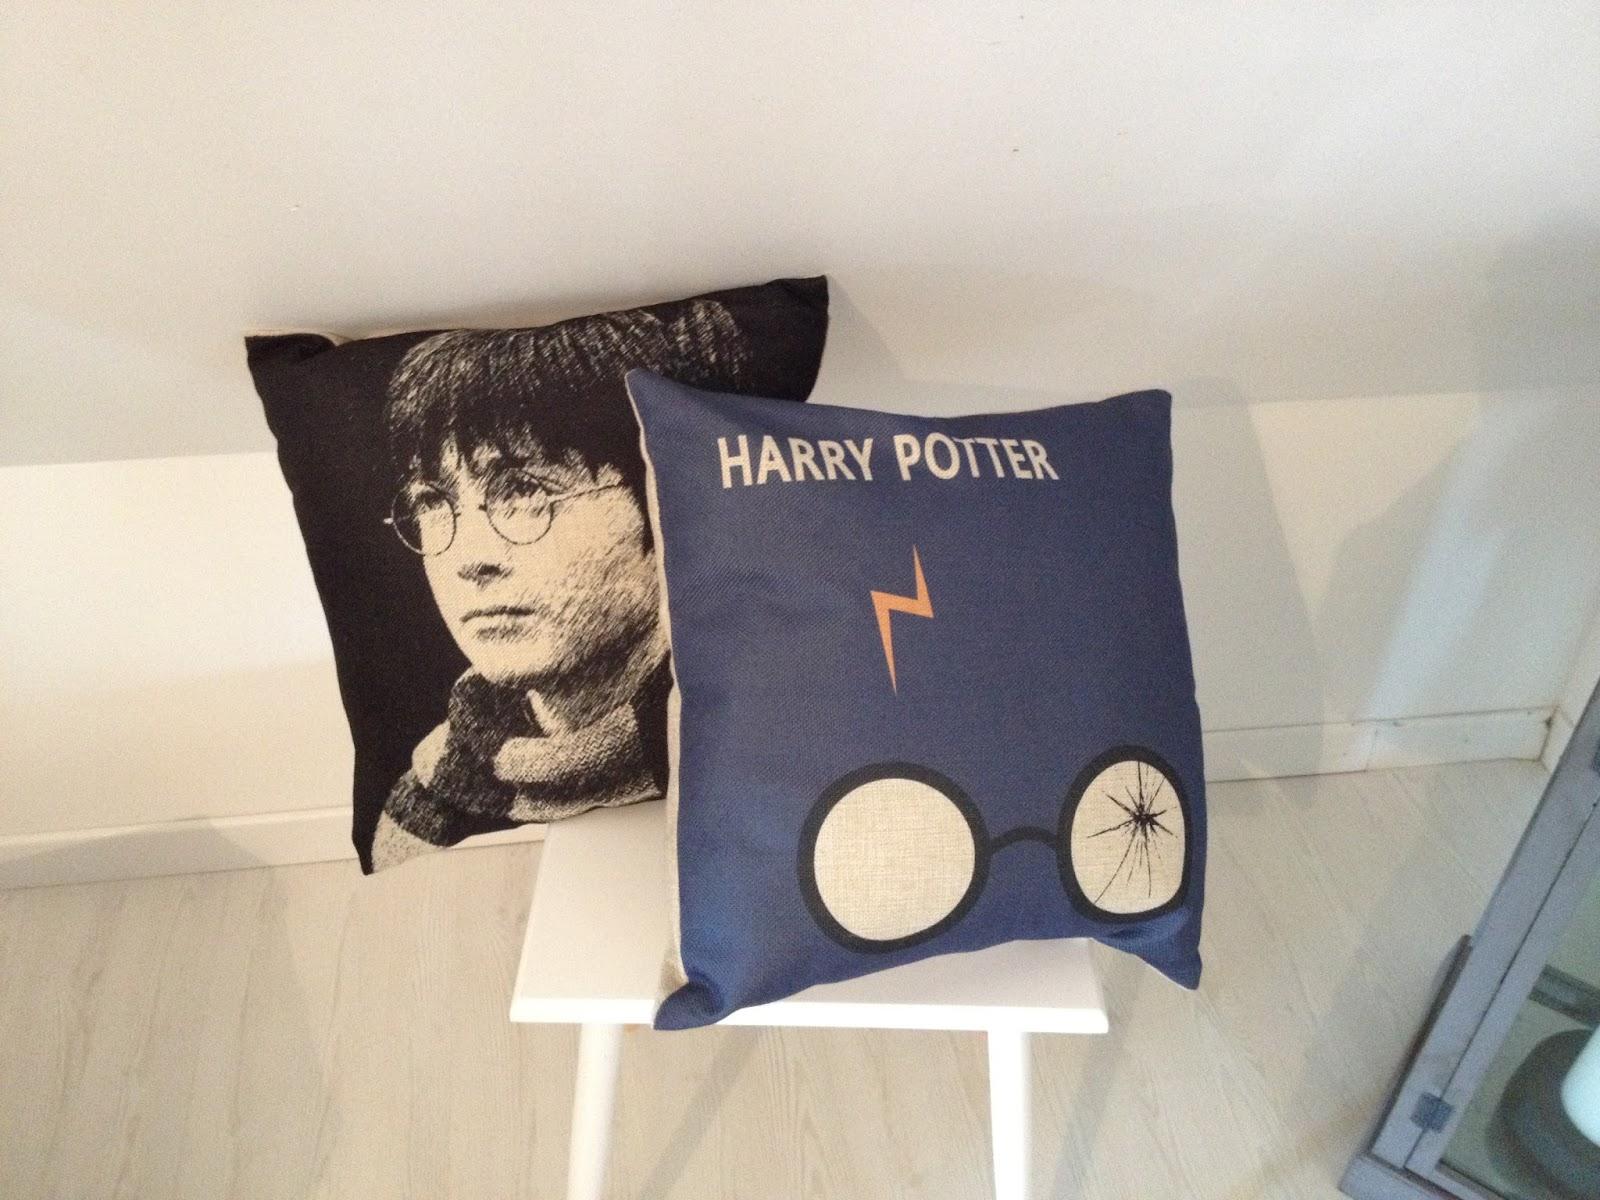 collection et cr ations harry potter d co du salon la fa on harry potter. Black Bedroom Furniture Sets. Home Design Ideas